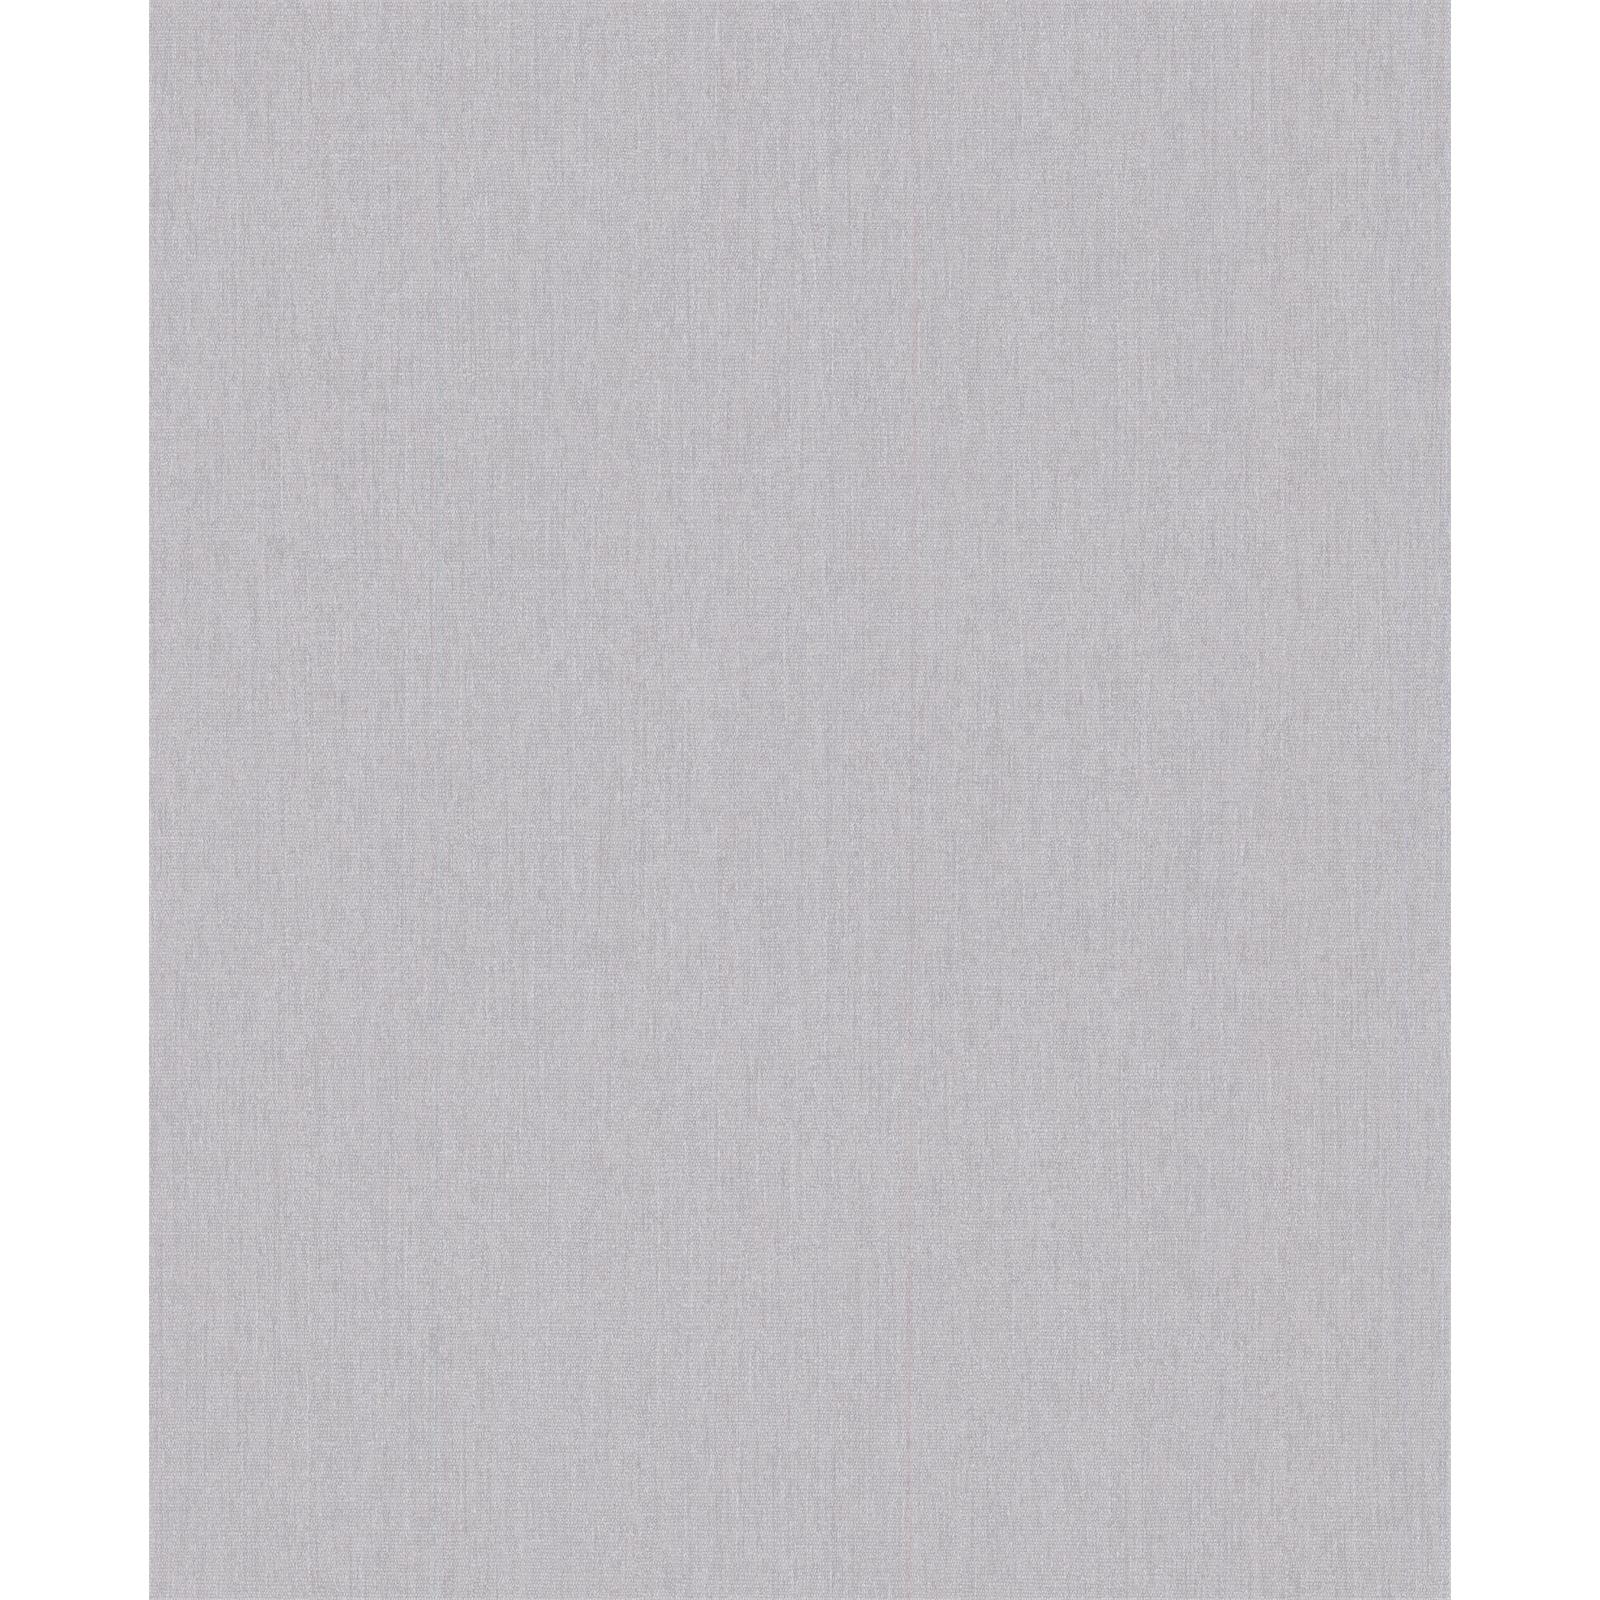 Superfresco Easy Calico Grey Wallpaper - Sample Calico Grey